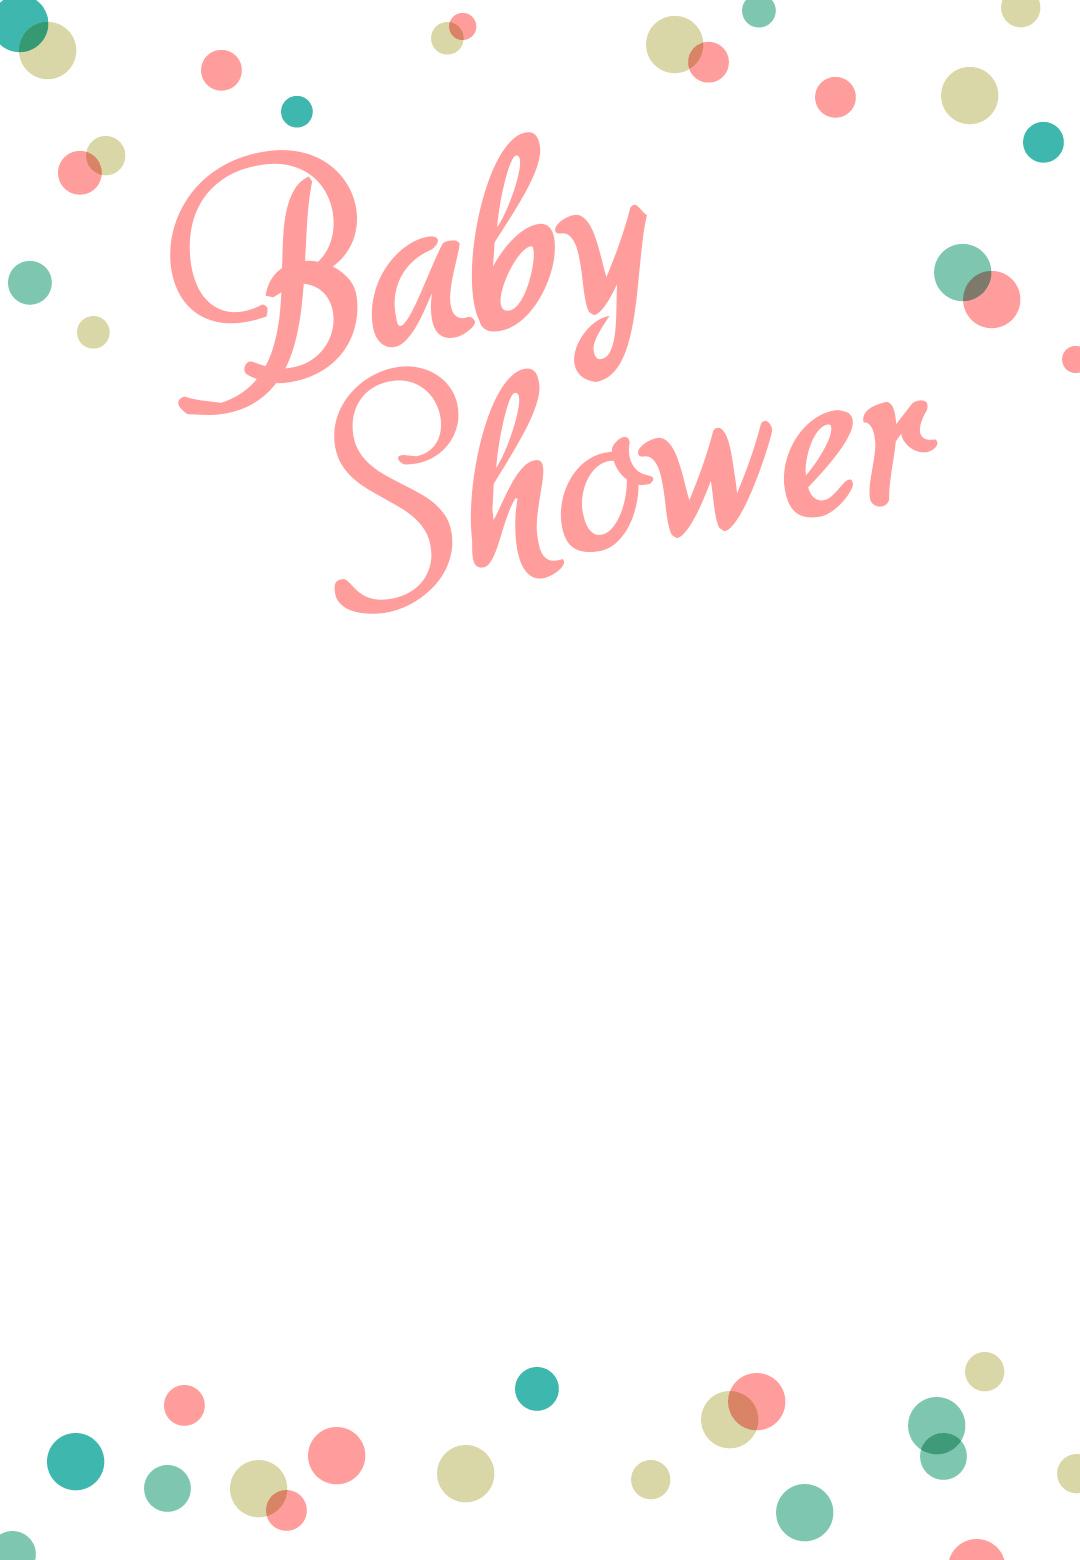 Dancing Dots Borders - Free Printable Baby Shower Invitation - Free Printable Baby Borders For Paper